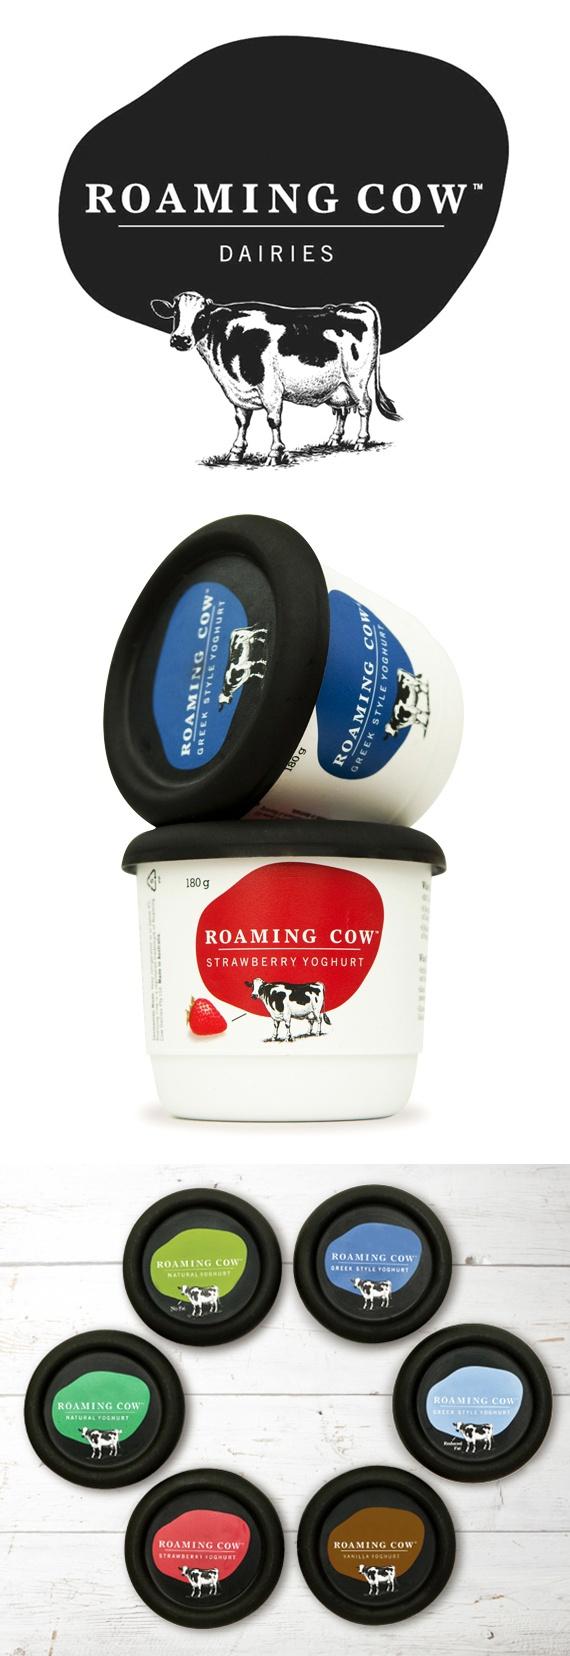 Roaming Cow Dairies | Australia